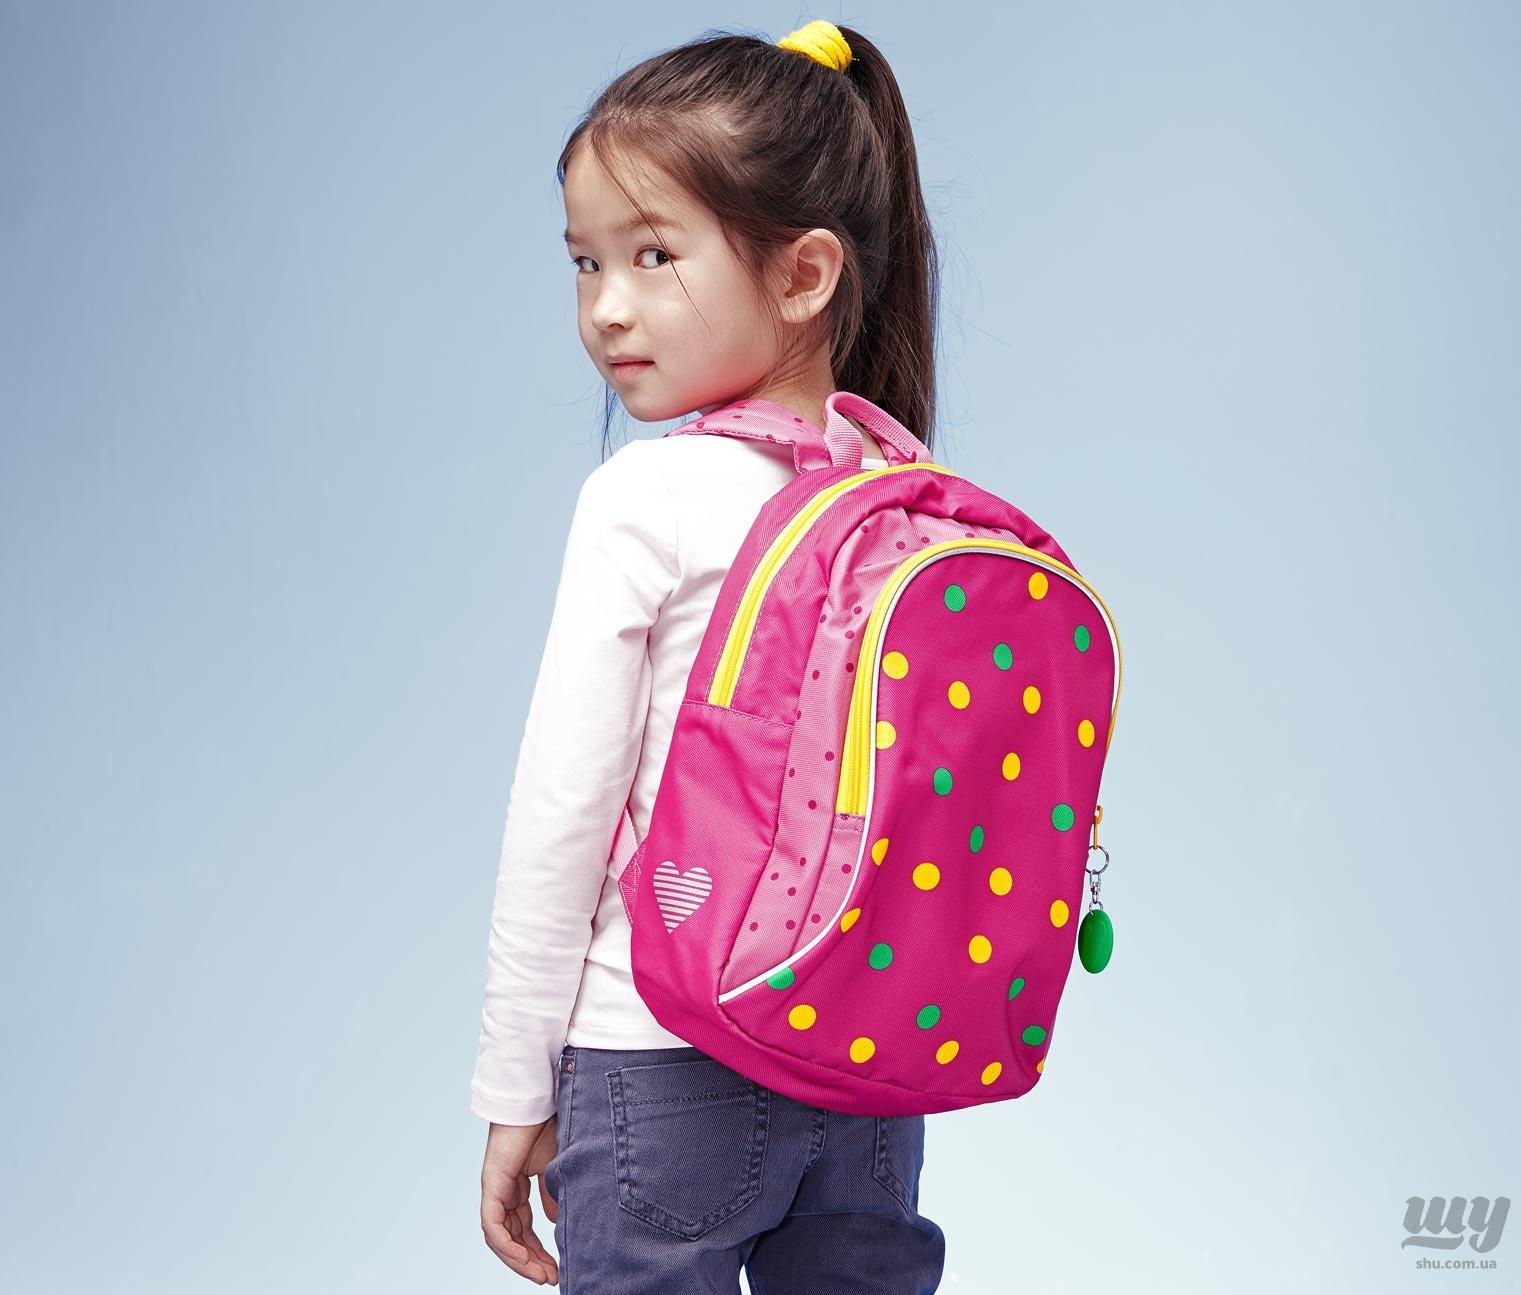 rucksack-pink-rosa-gelb.jpg